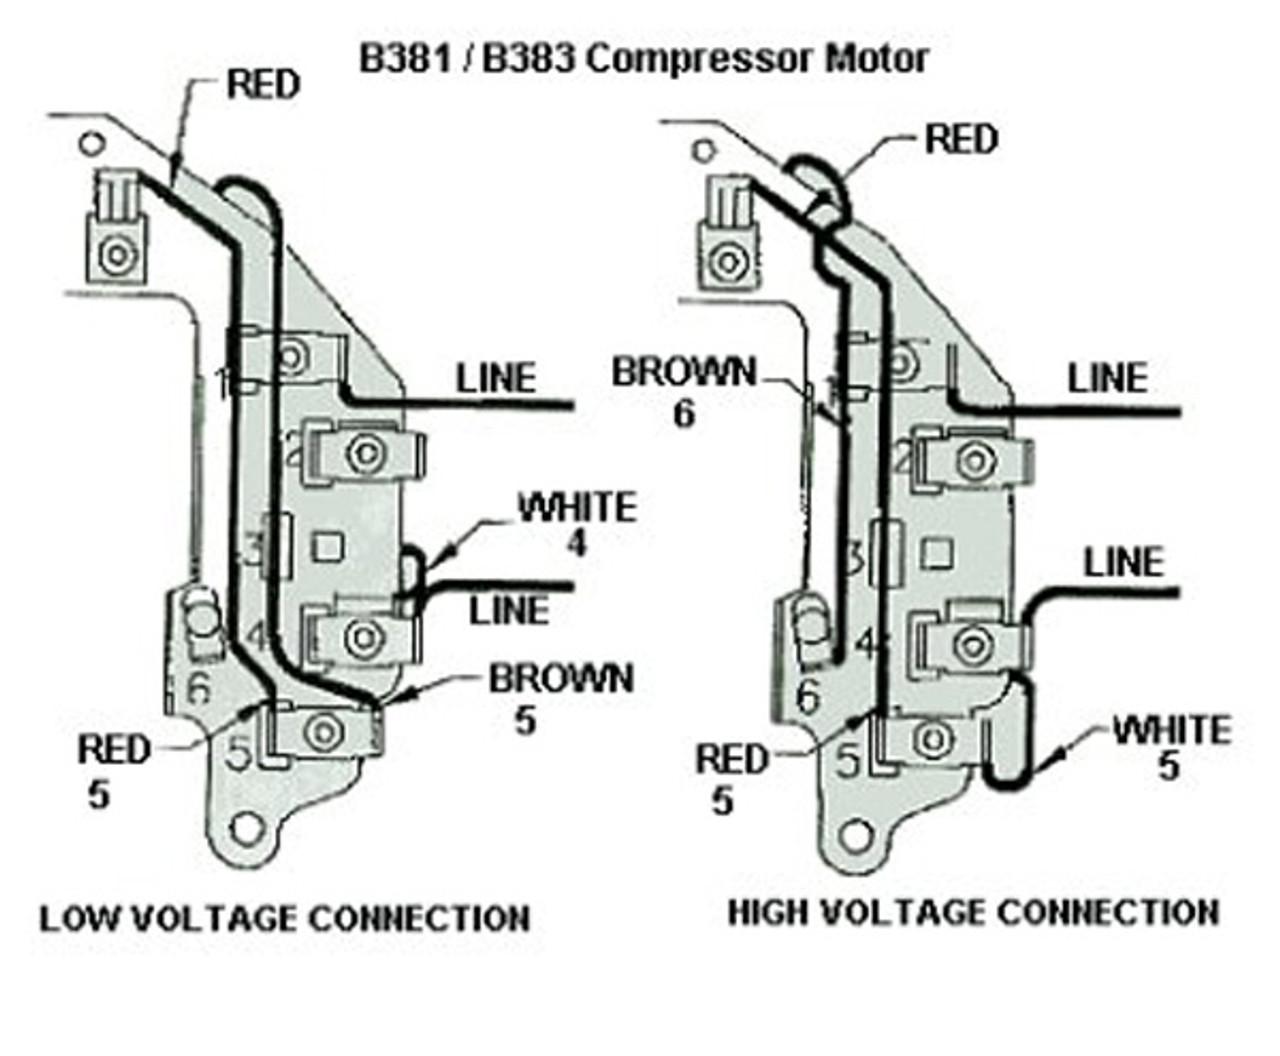 3 HP SPL 3450 RPM U56 Frame 115/230V Air Compressor Motor - Century # B383Electric Motor Warehouse